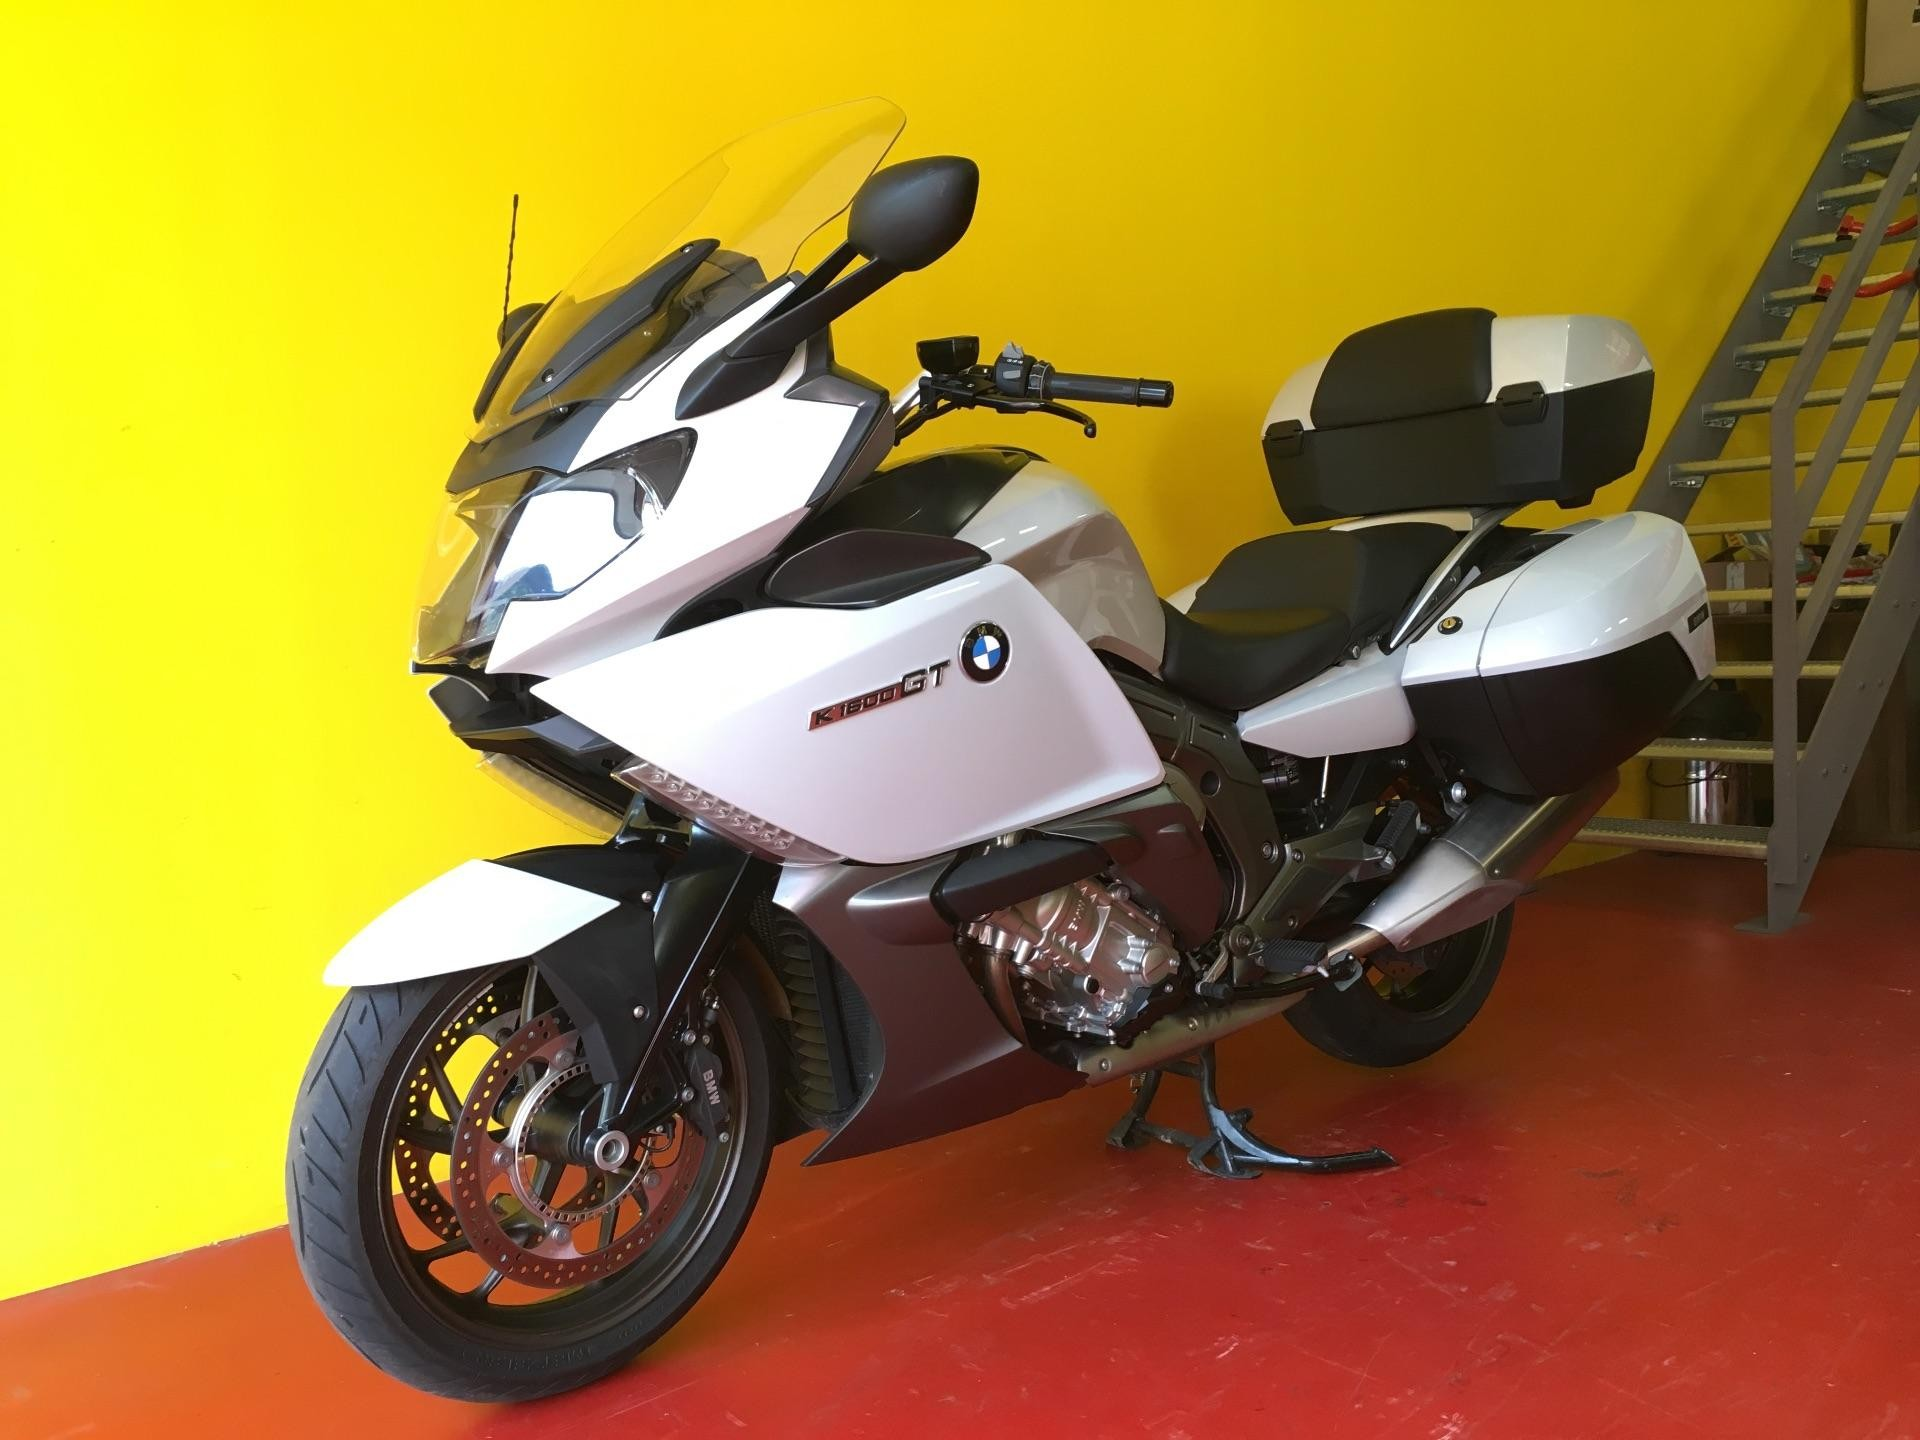 motorrad occasion kaufen bmw k 1600 gt abs centro moto ticino camorino camorino. Black Bedroom Furniture Sets. Home Design Ideas